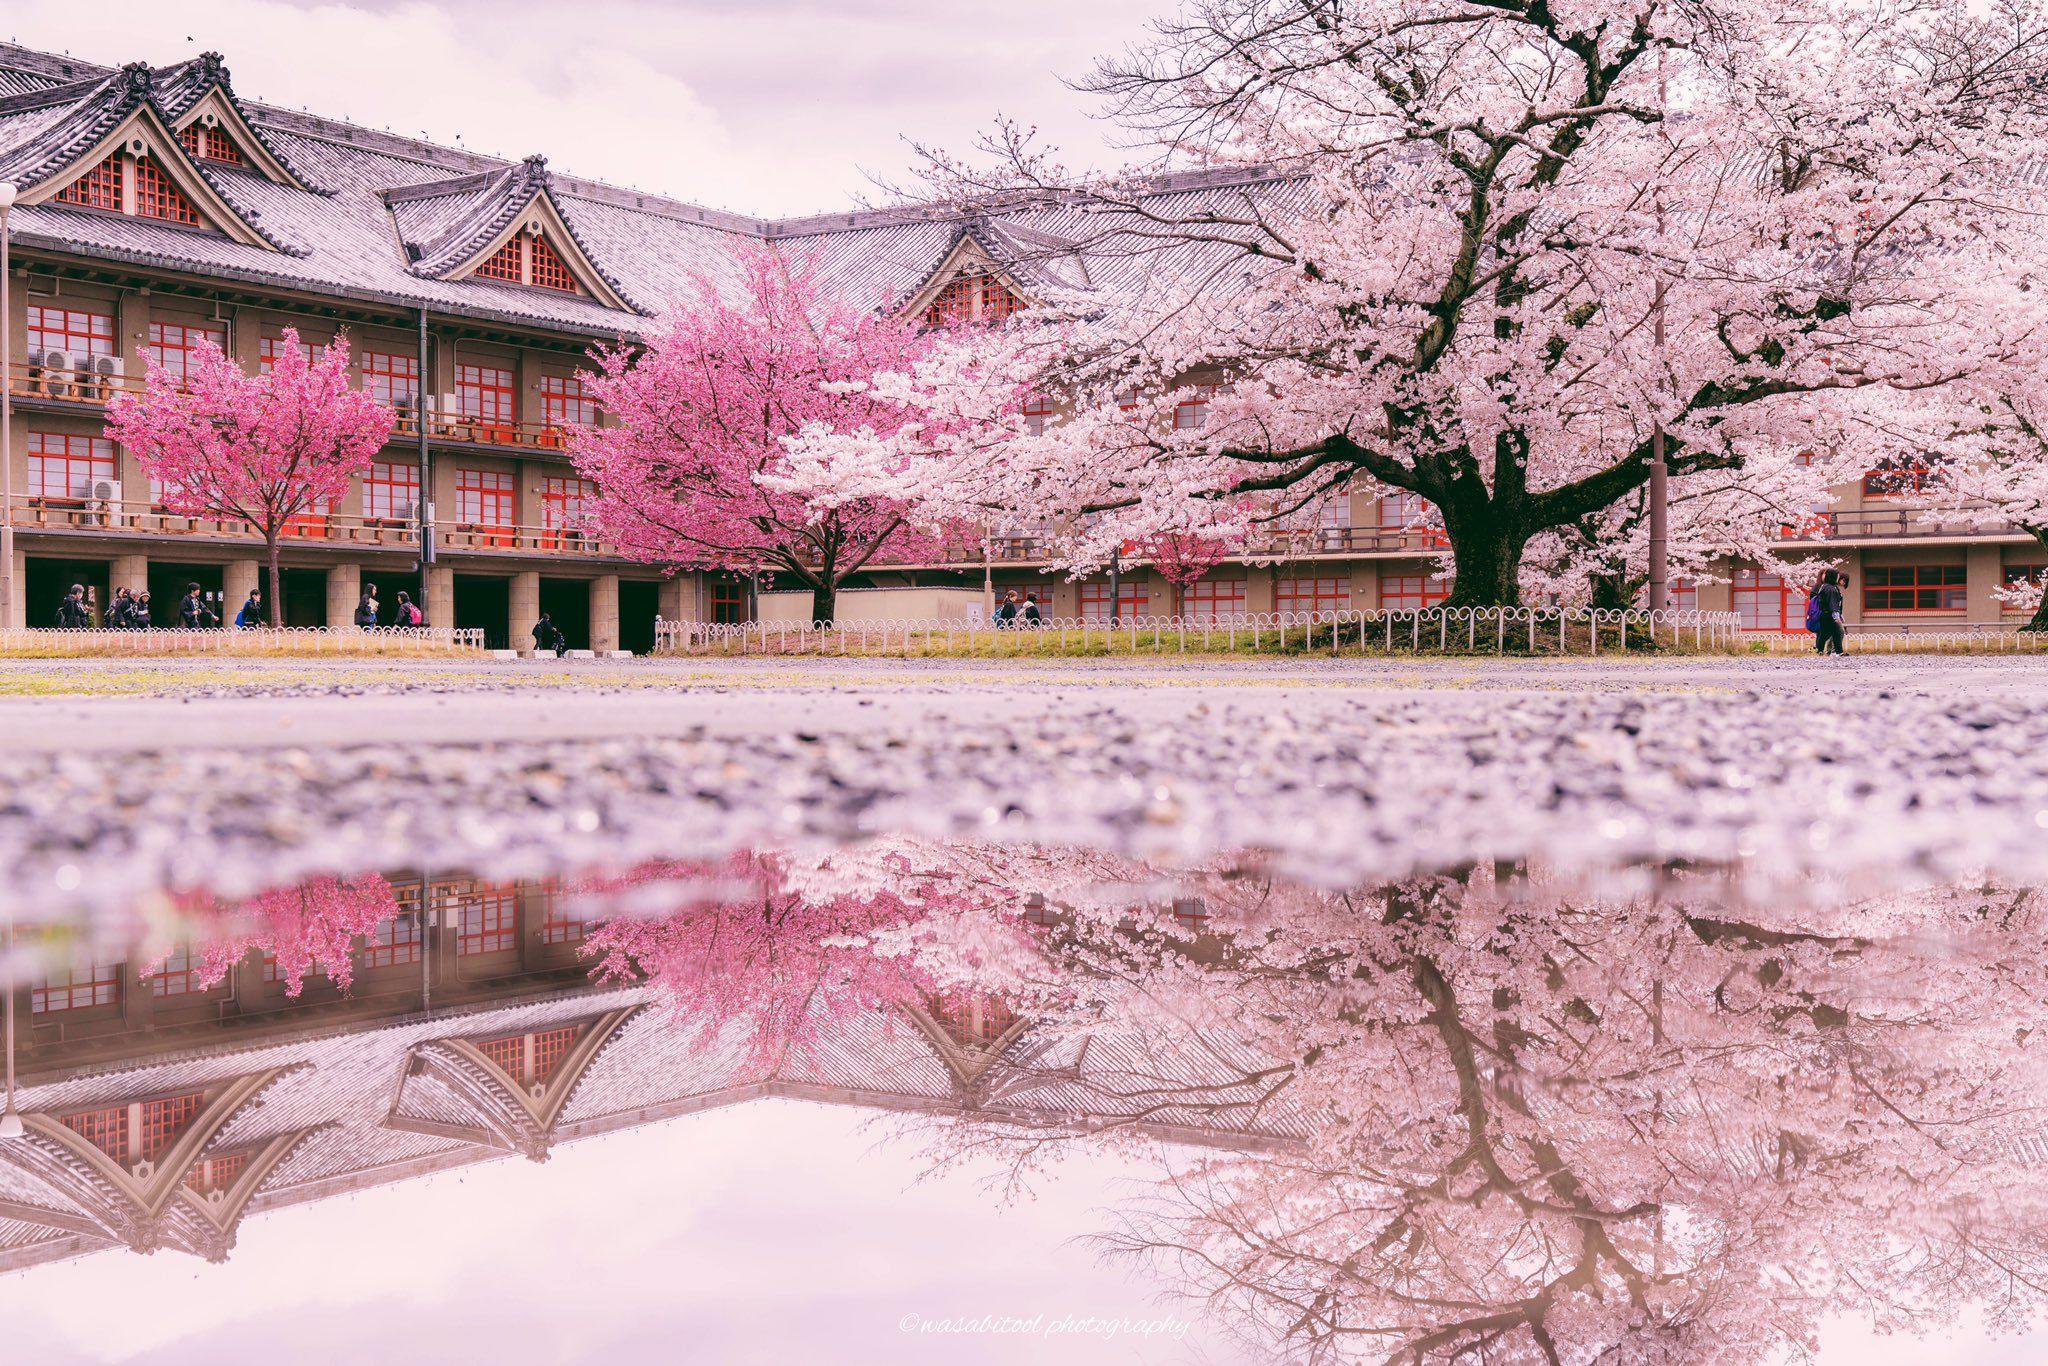 Wasabitool On Twitter Cherry Blossom Blossom House Blossom